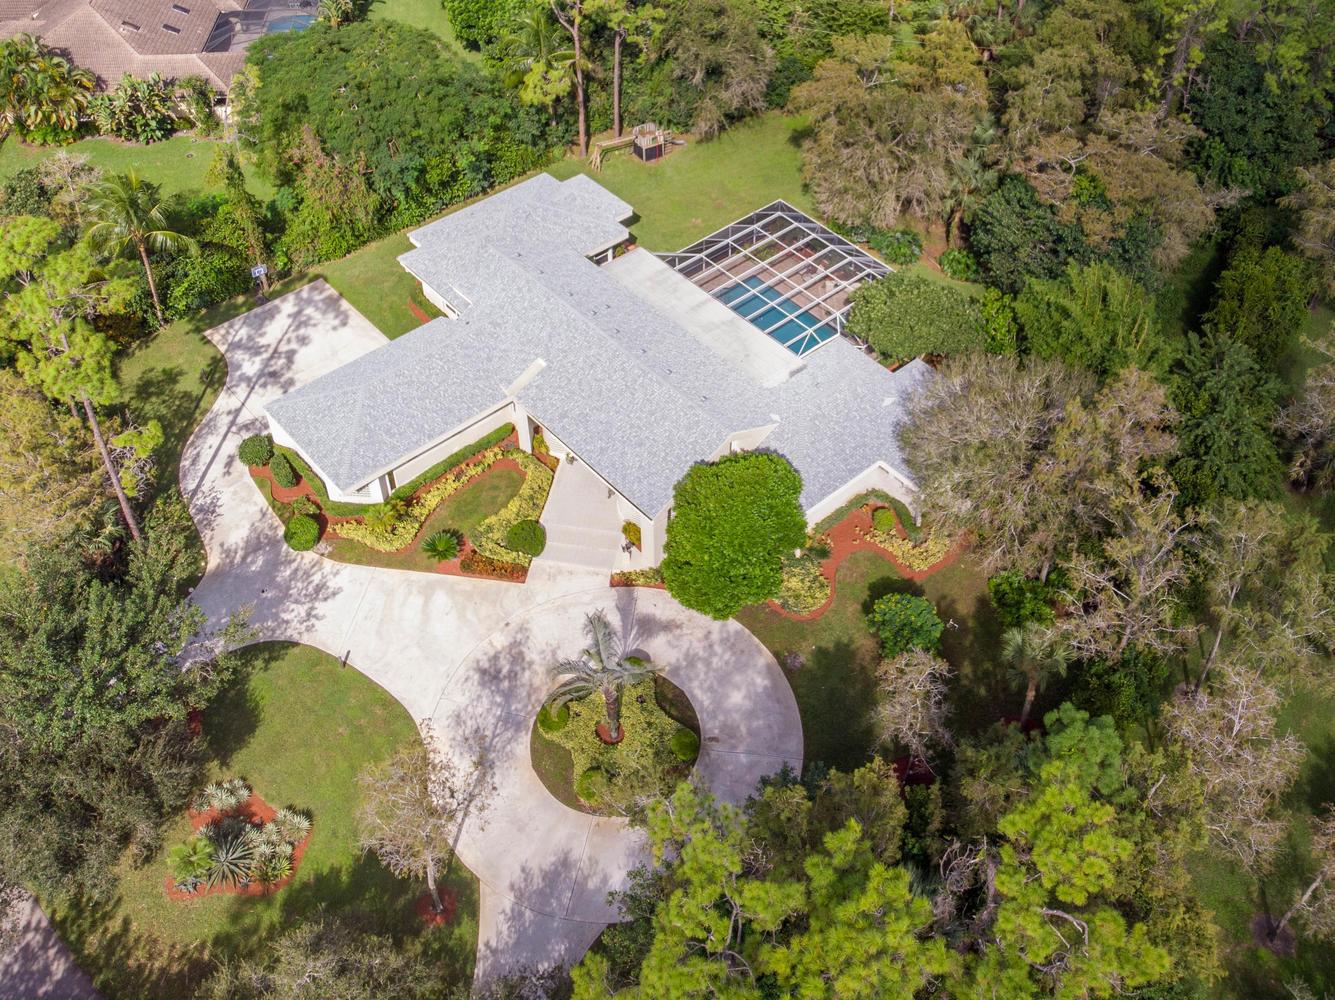 PADDOCK PARK WELLINGTON FLORIDA